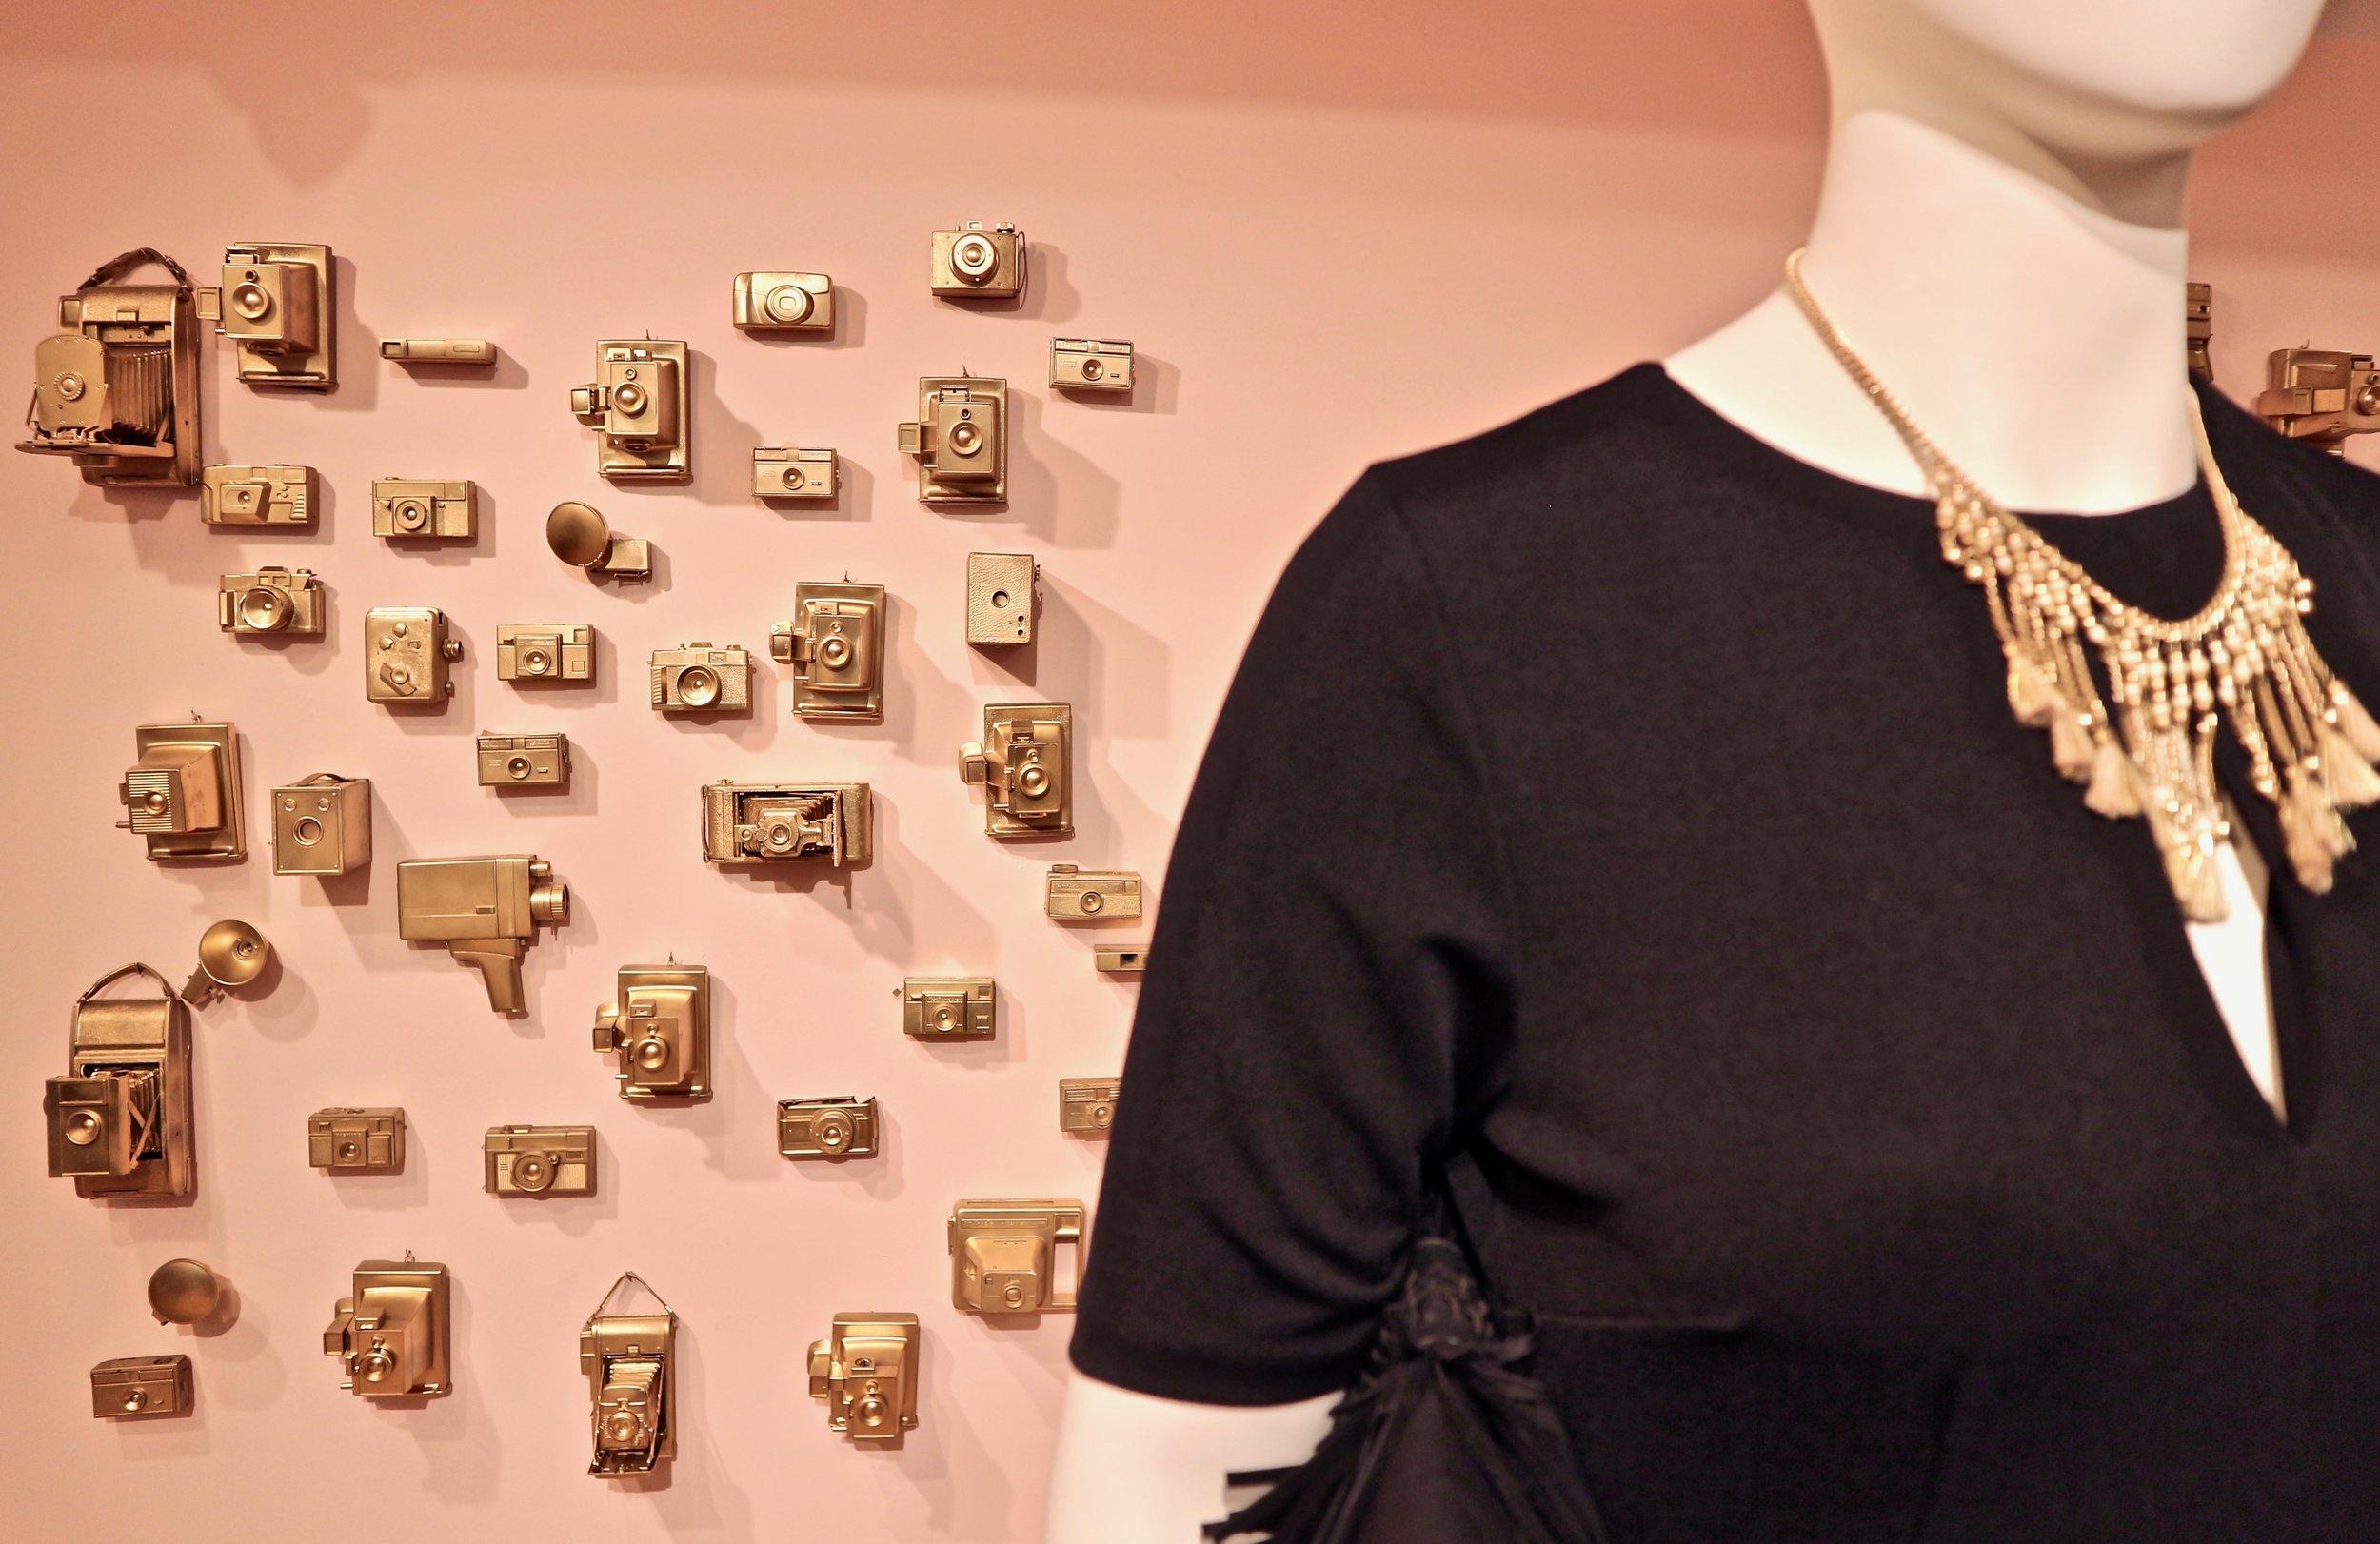 ELOQUIIs-custom-SELF-ie-wall-by-Ati-Williams-photo-credit-Hafsa-Siddiqi.jpg